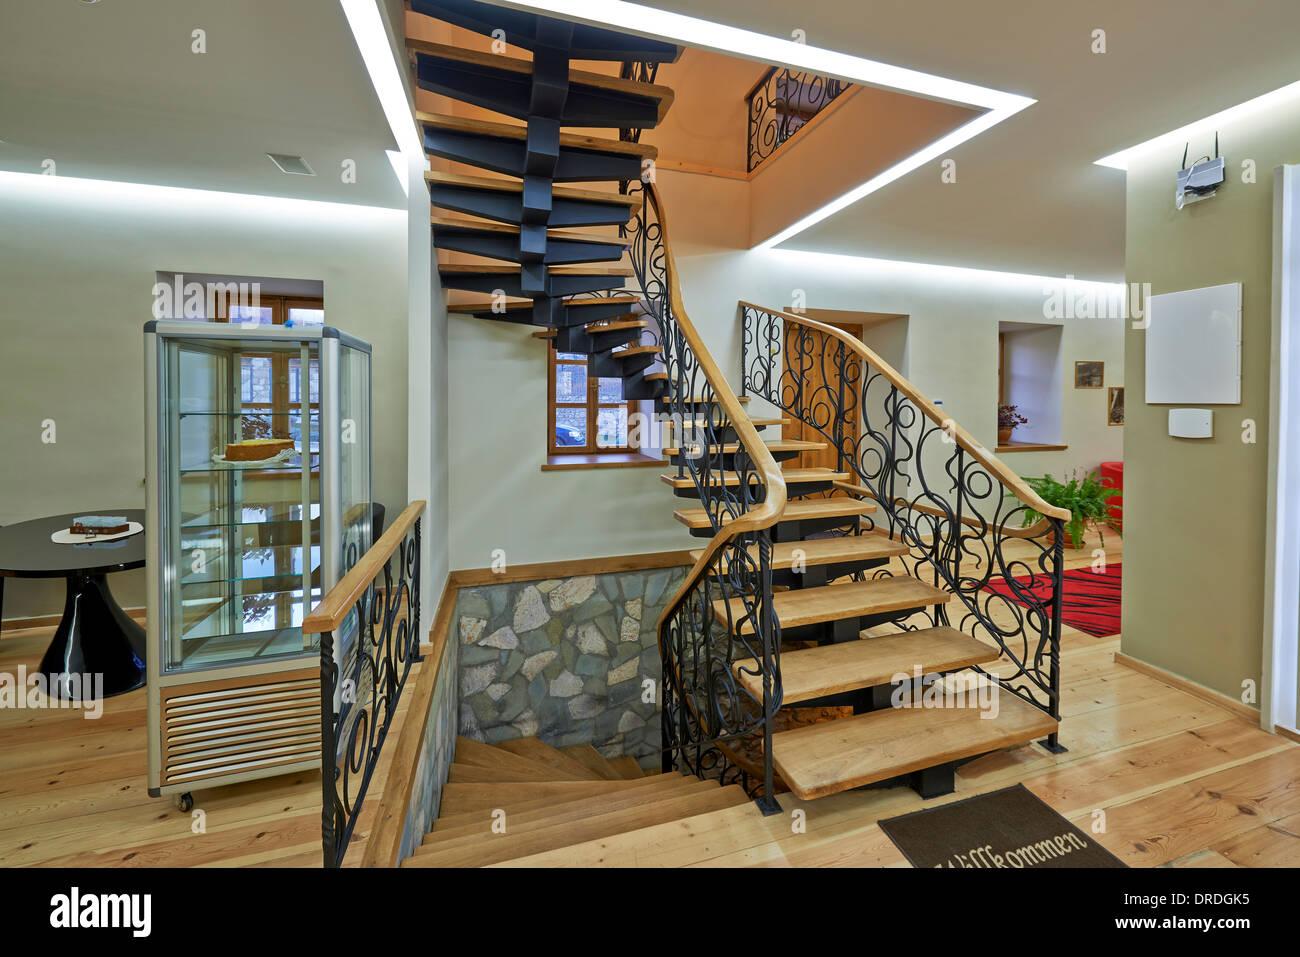 circular stair in lobby, interior shot of Hotel German Mill Bolnisi, Kvemo Kartli, Georgia - Stock Image